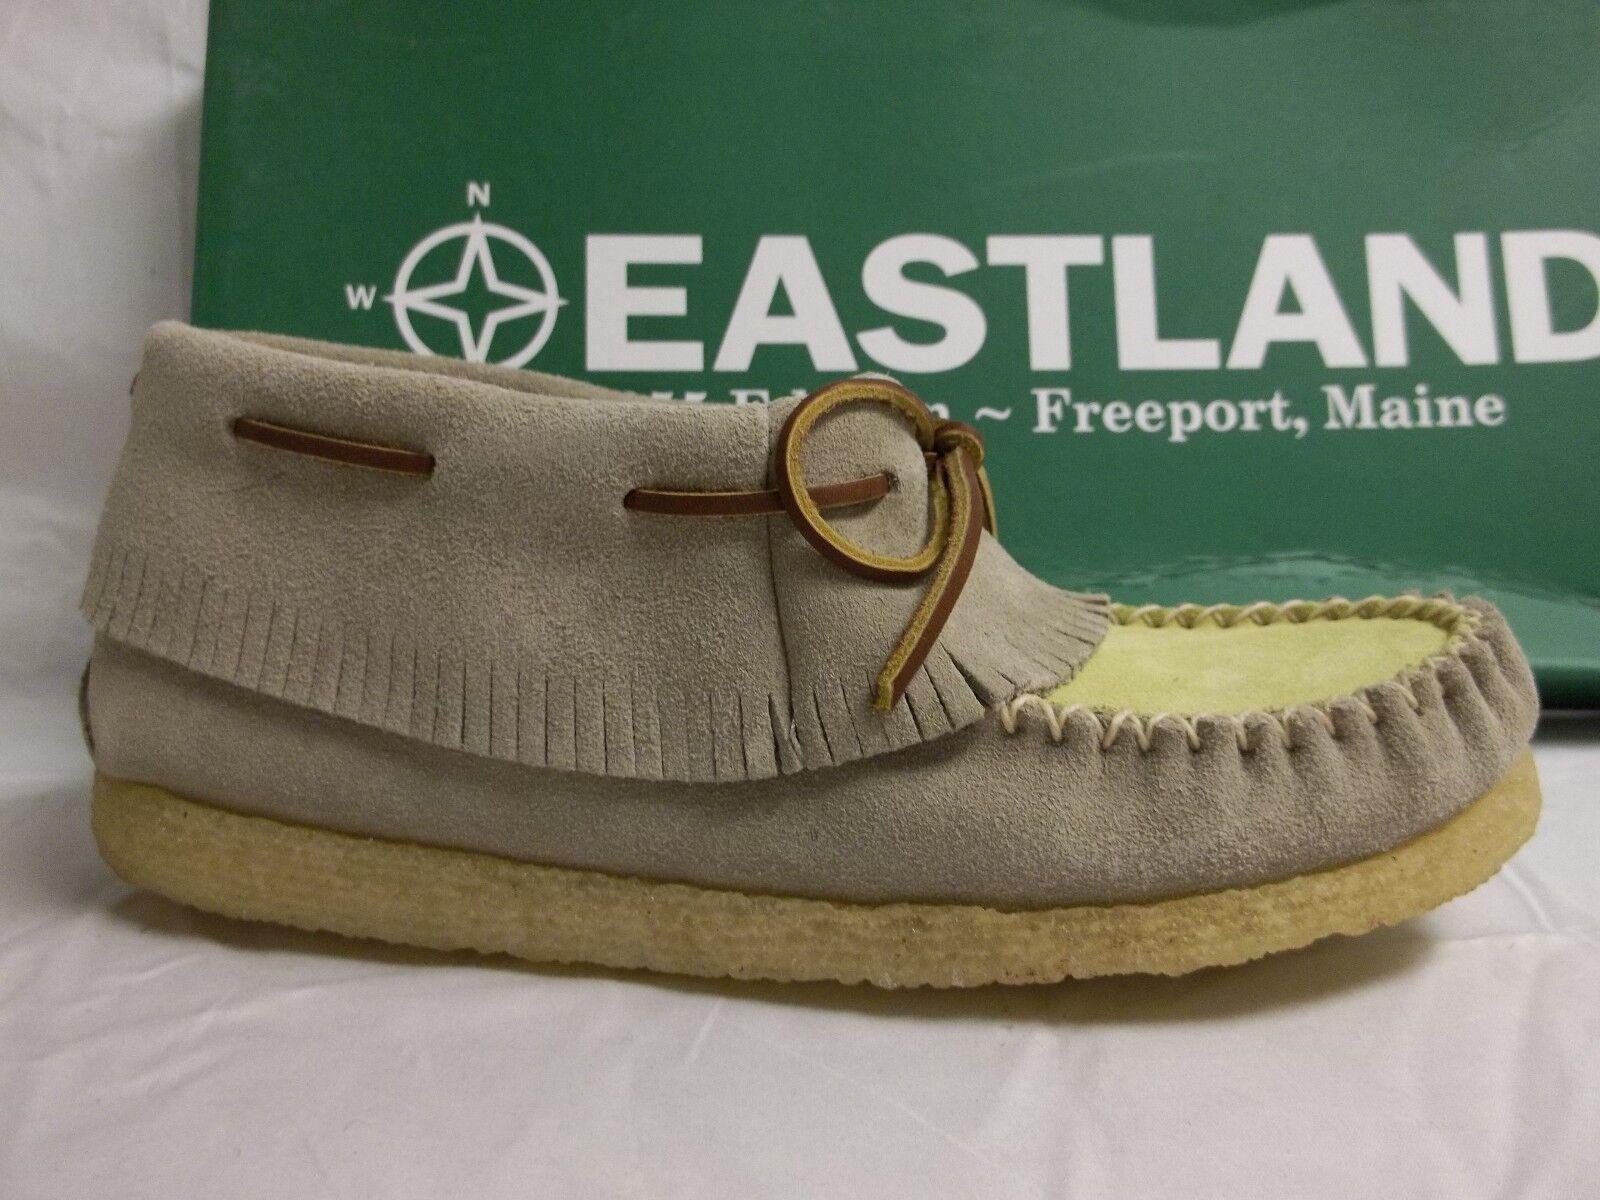 Eastland Größe 6 M Casco Taupe Yellow Suede Moccasins NEU Damenschuhe Schuhes